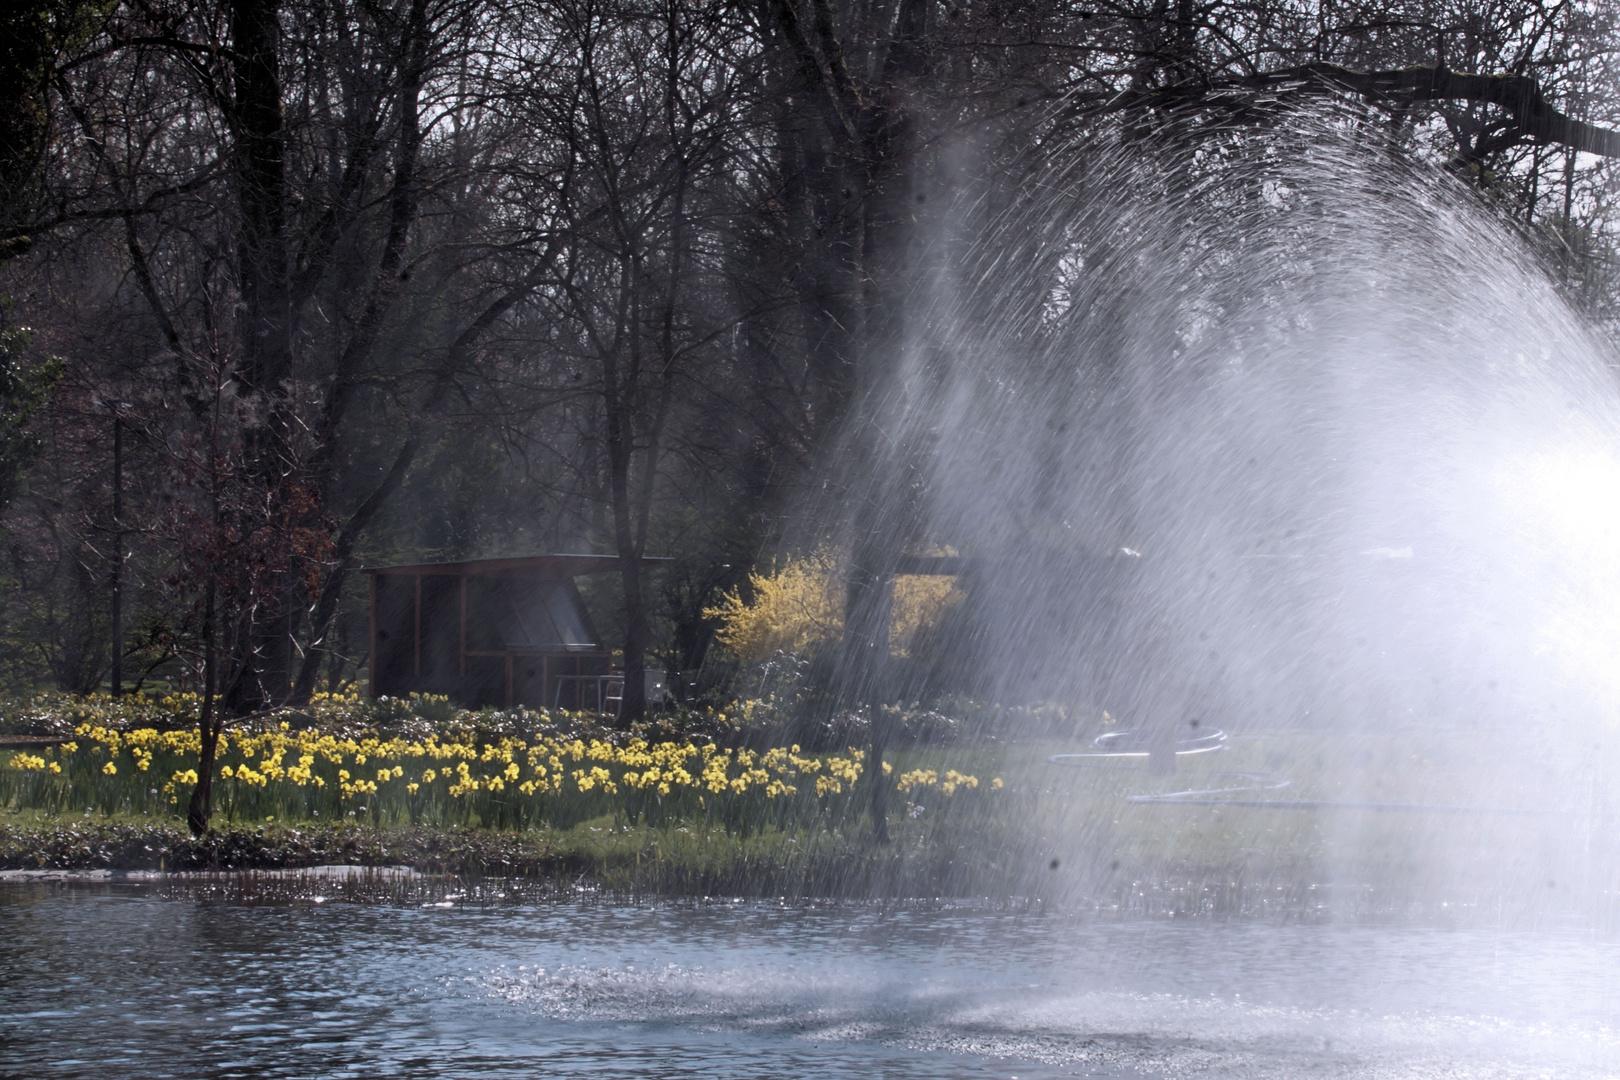 Springbrunnen im Teich vom Kurpark Bad Bellingen - Frühlingsanfang